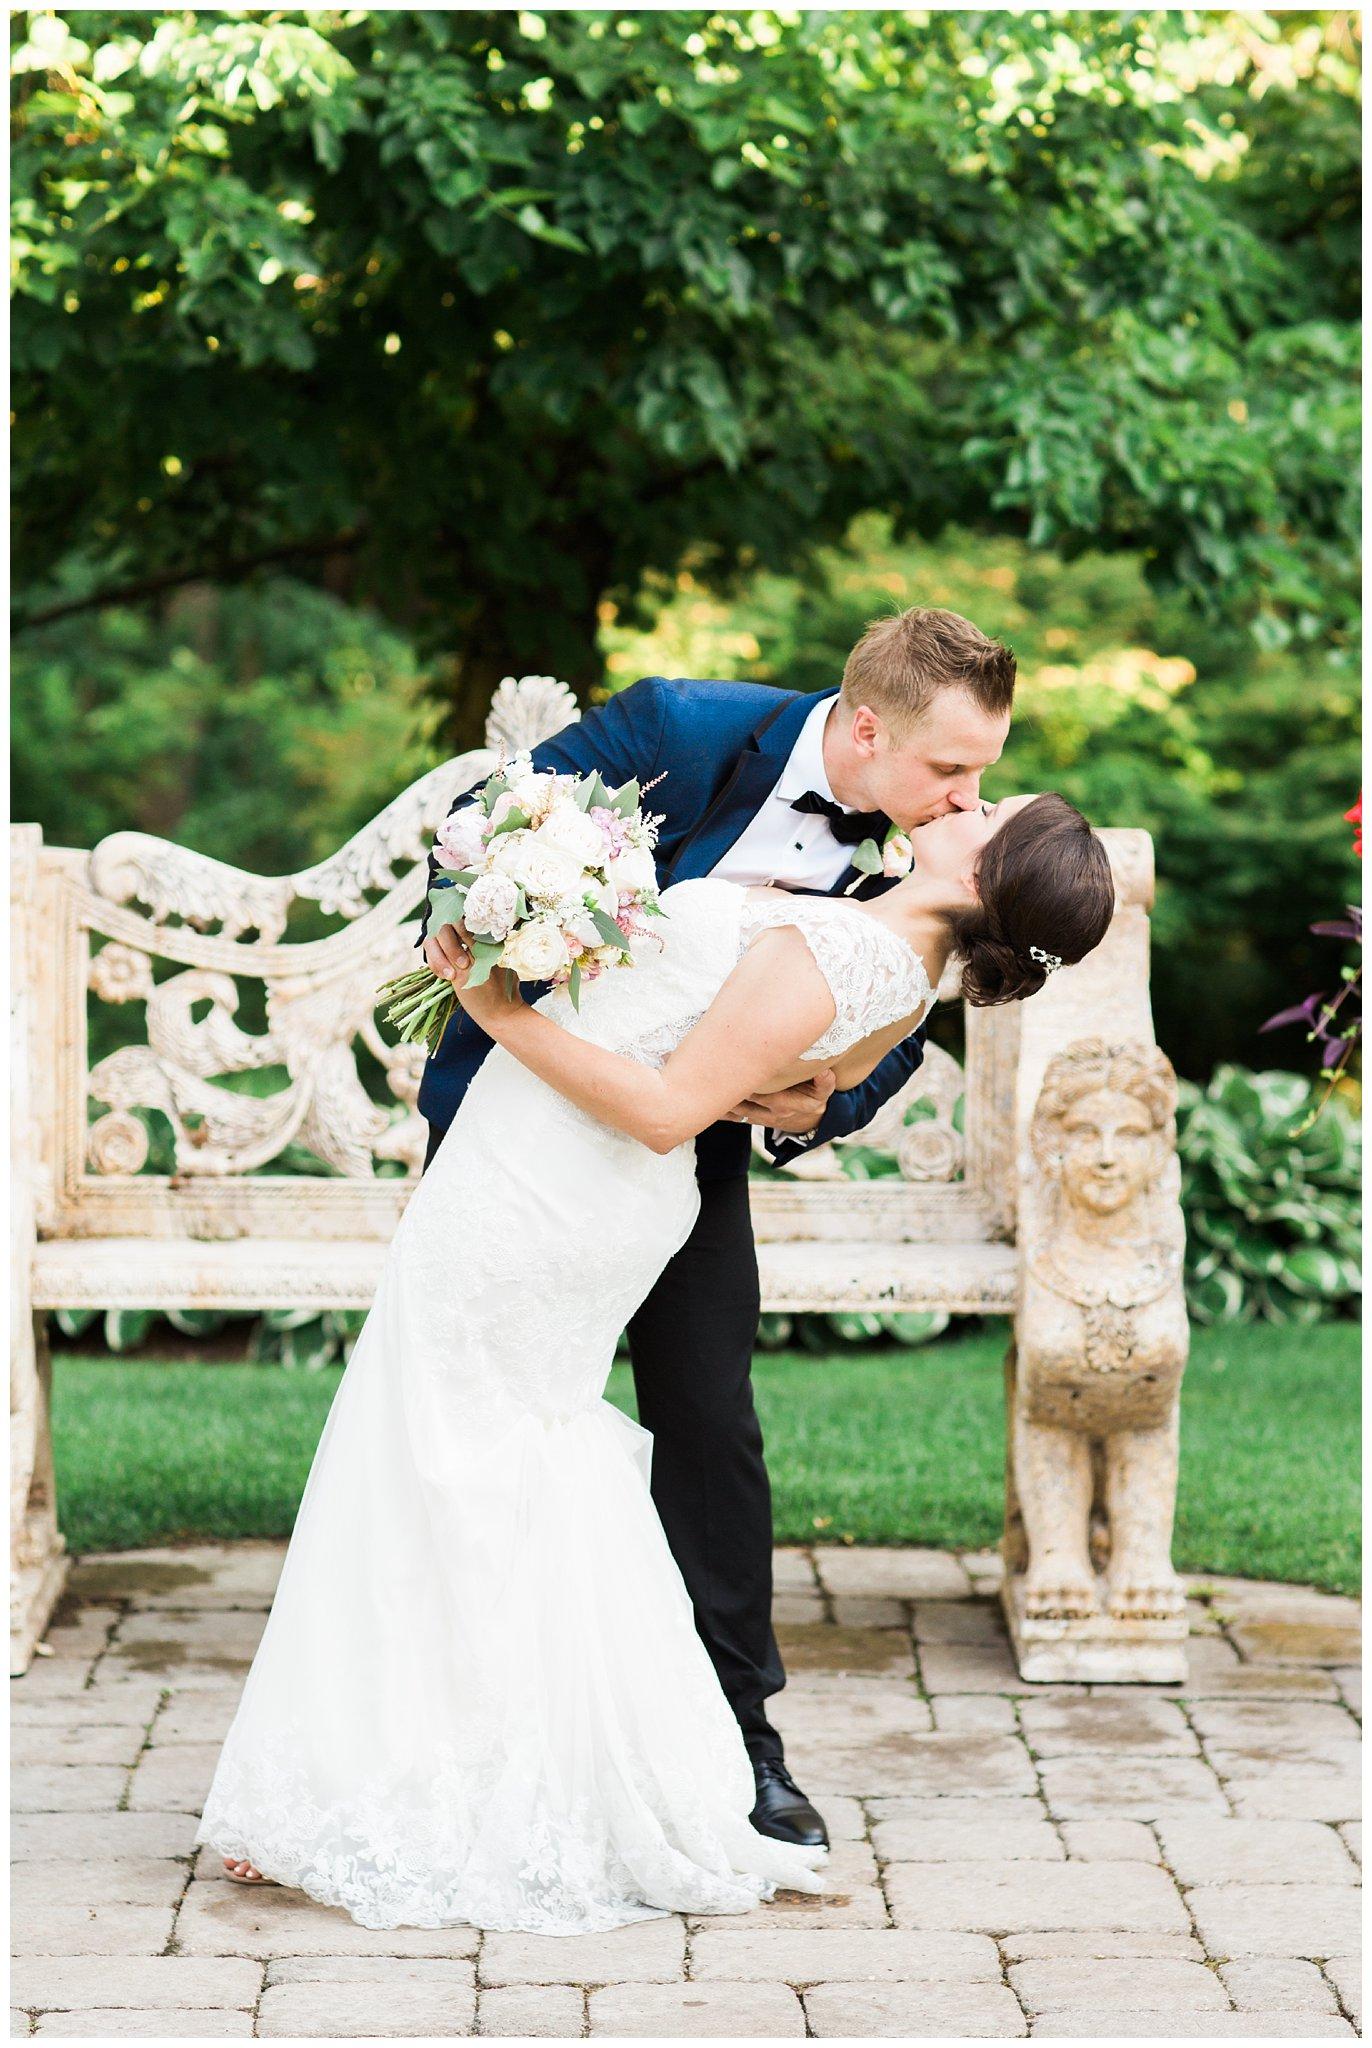 Alicia&Kurt_RavisloeCountryClubWedding_Chicagoweddingphotographer_RebeccaHaleyPhotography_0166.jpg